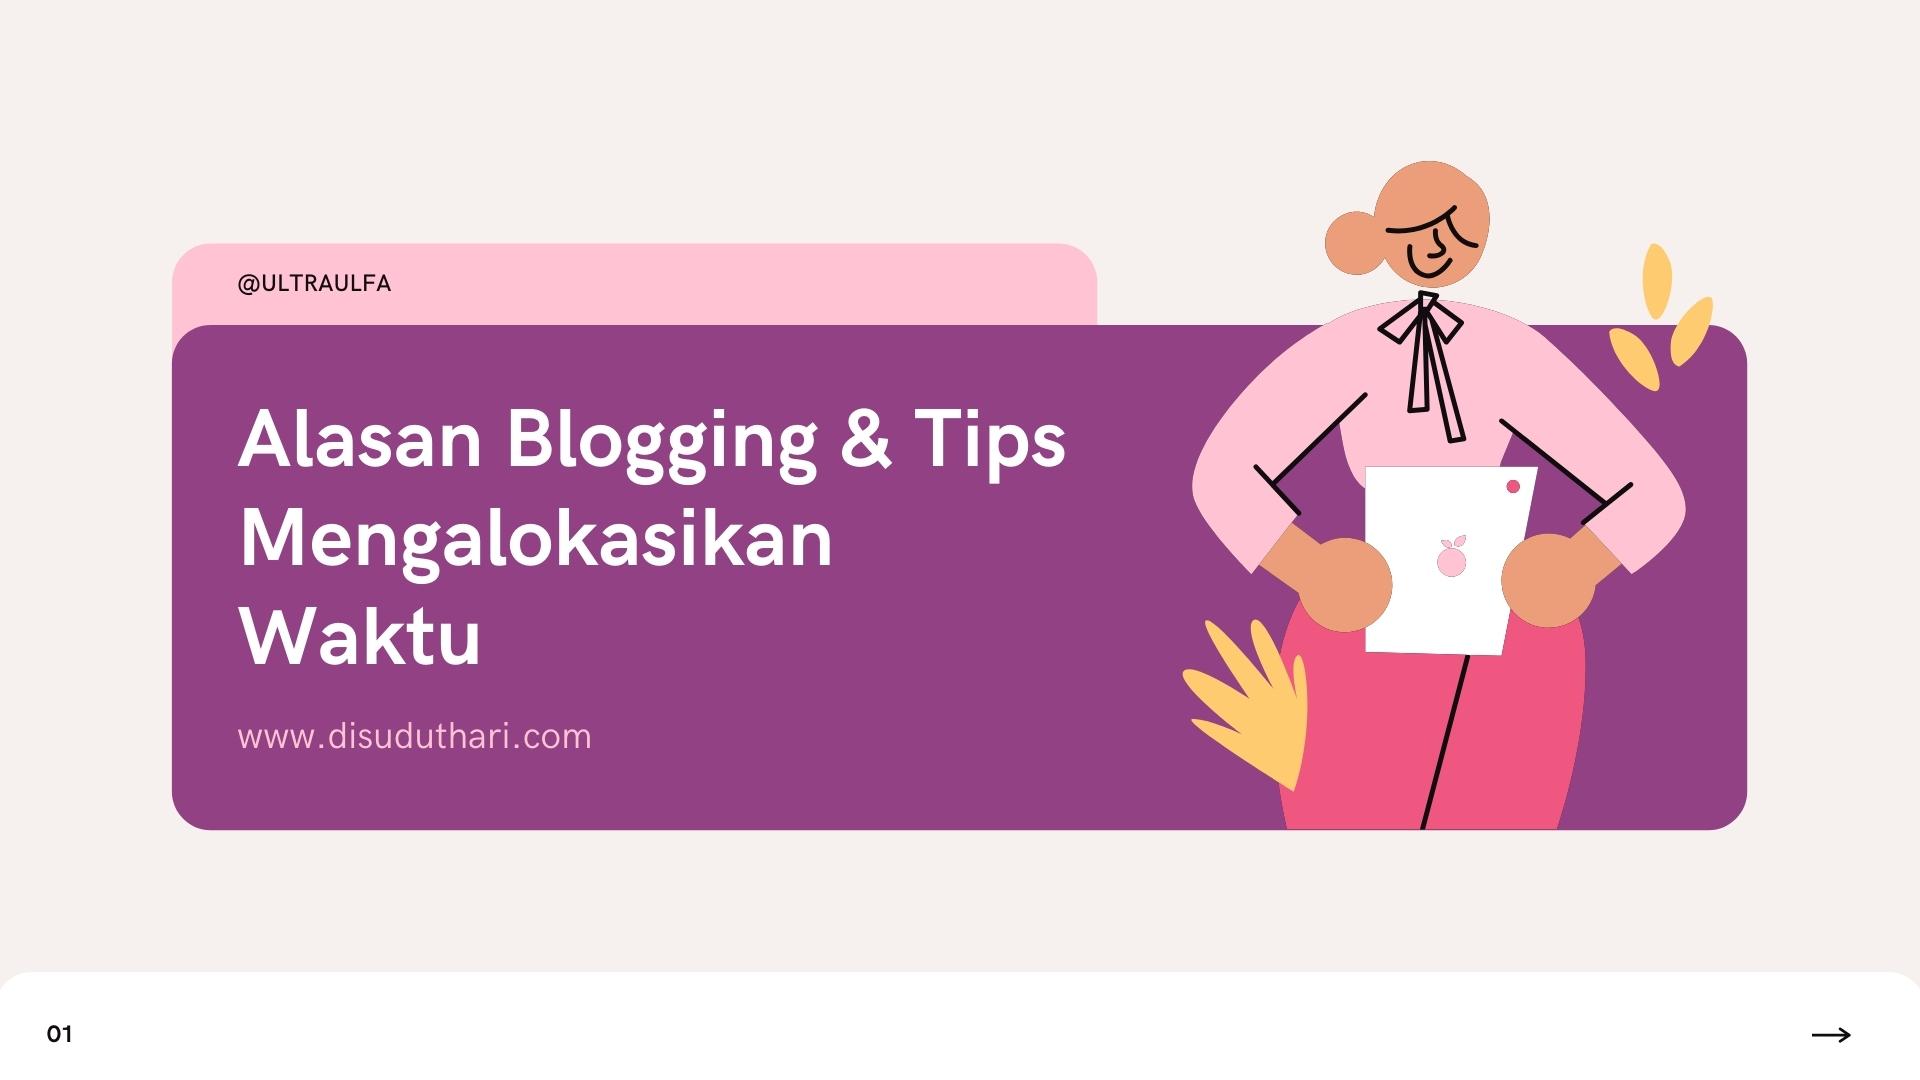 Alasan Blogging Tips Mengalokasikan Waktu